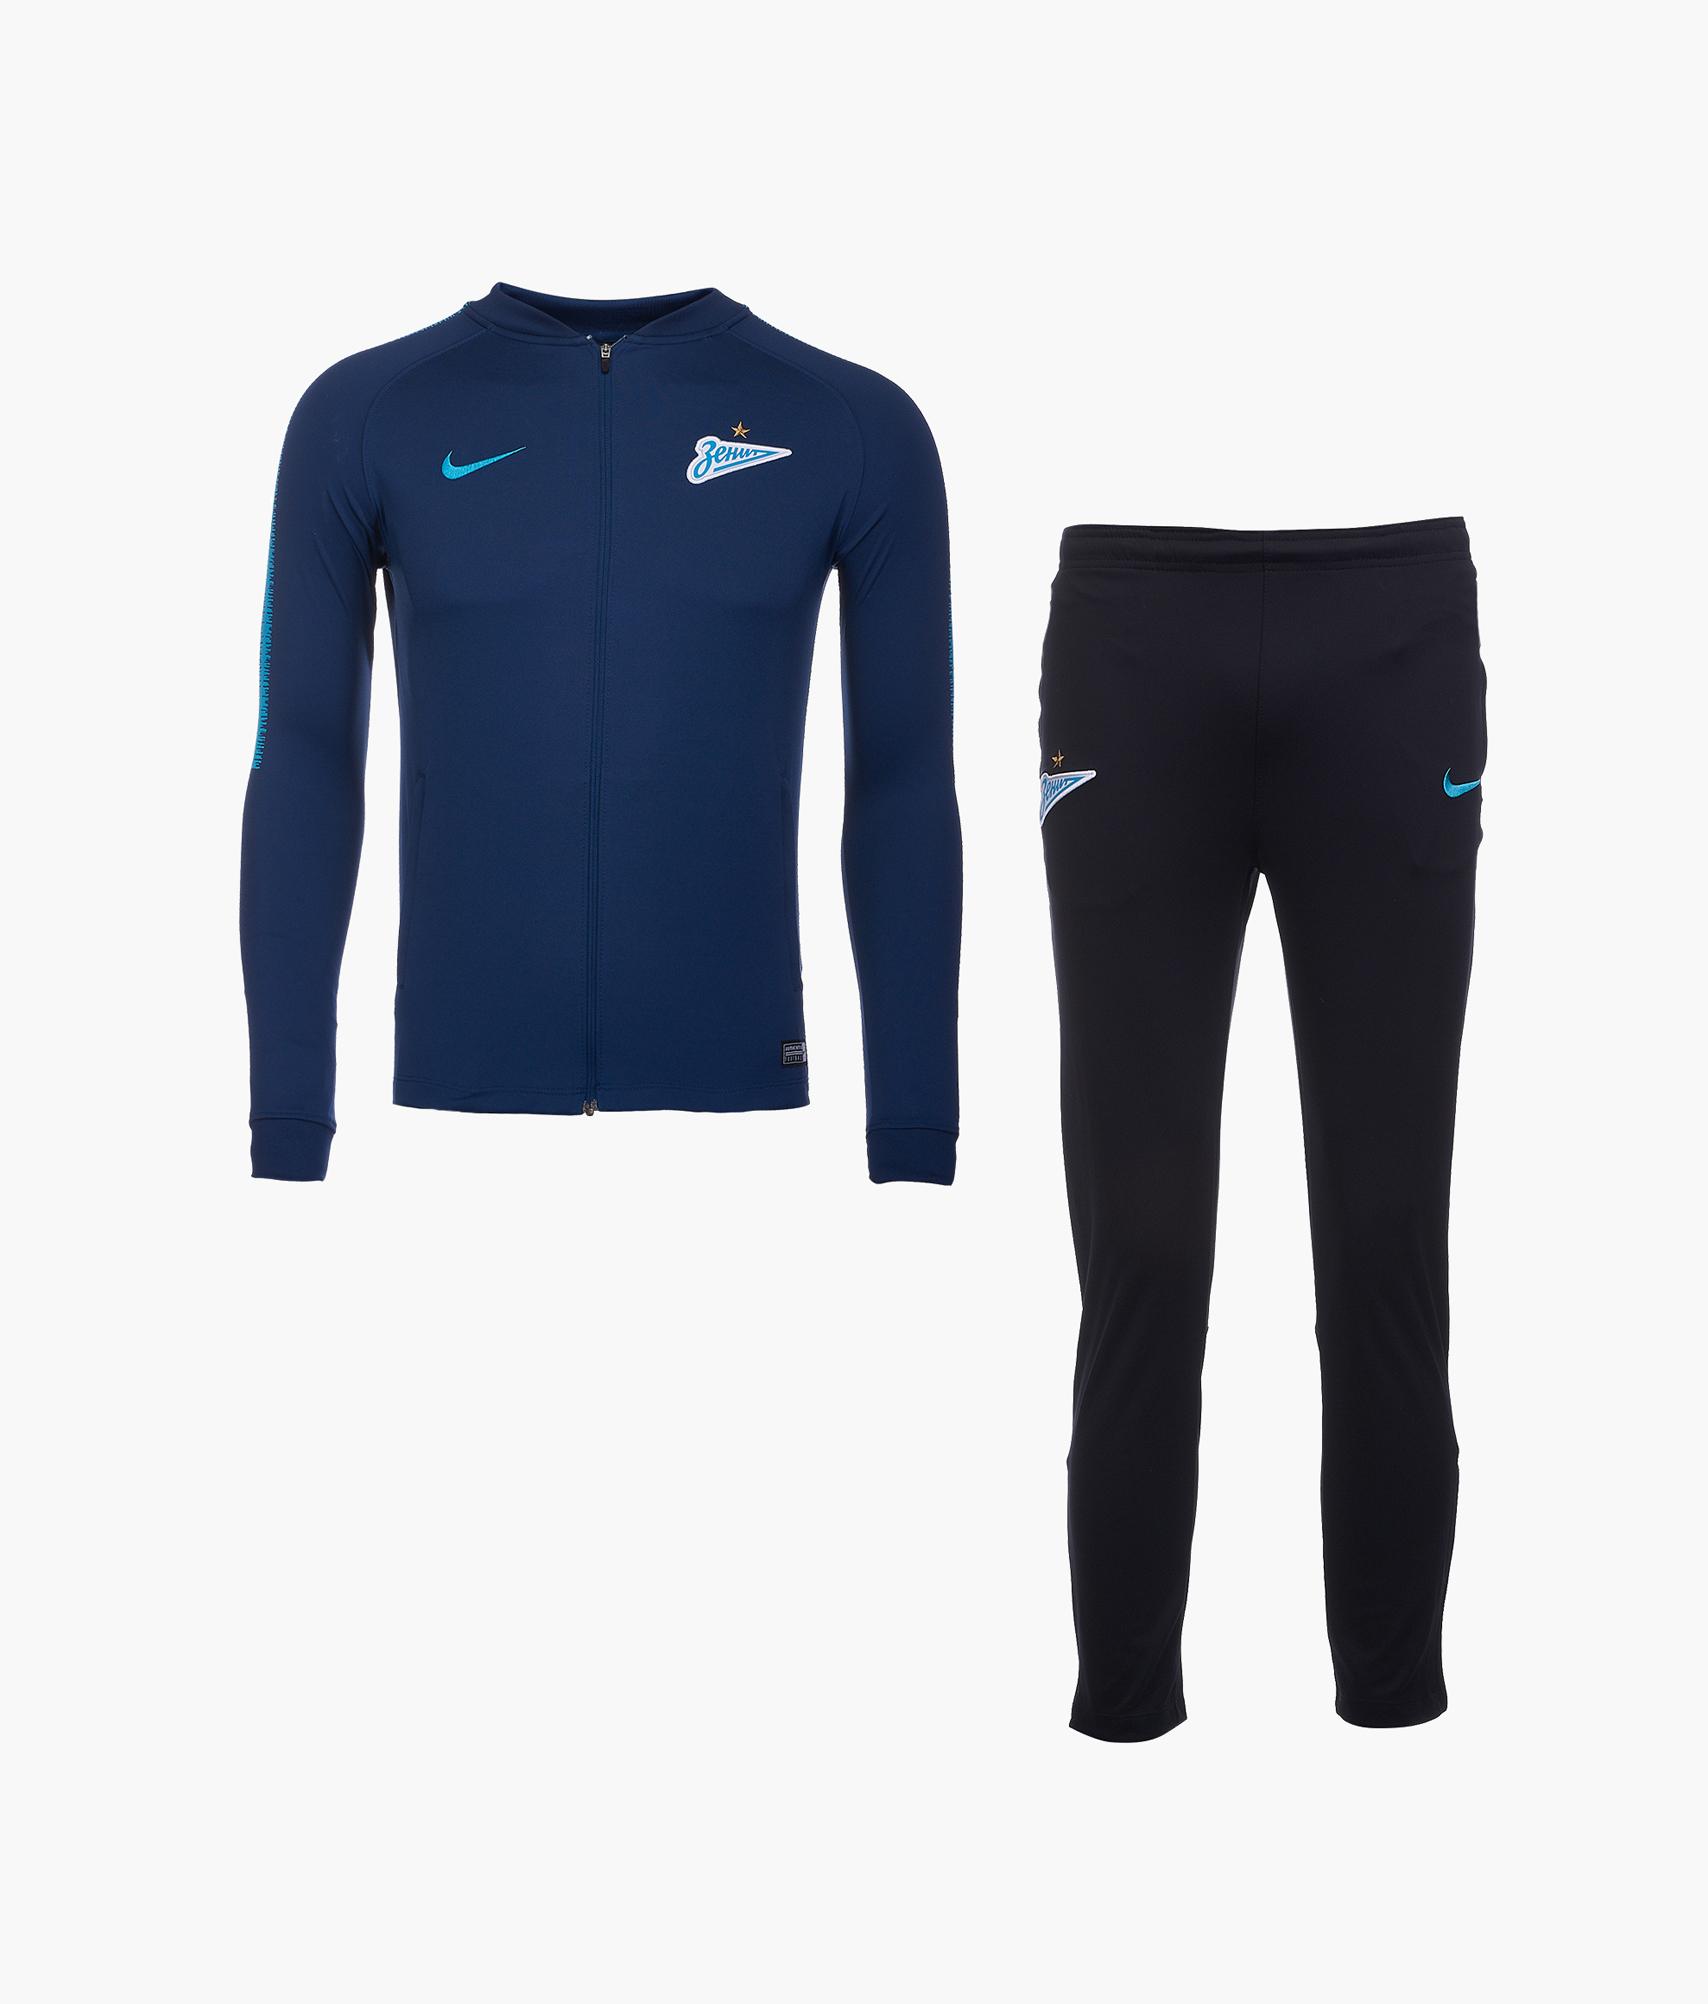 Костюм подростковый Nike Zenit сезона 2018/19 Nike